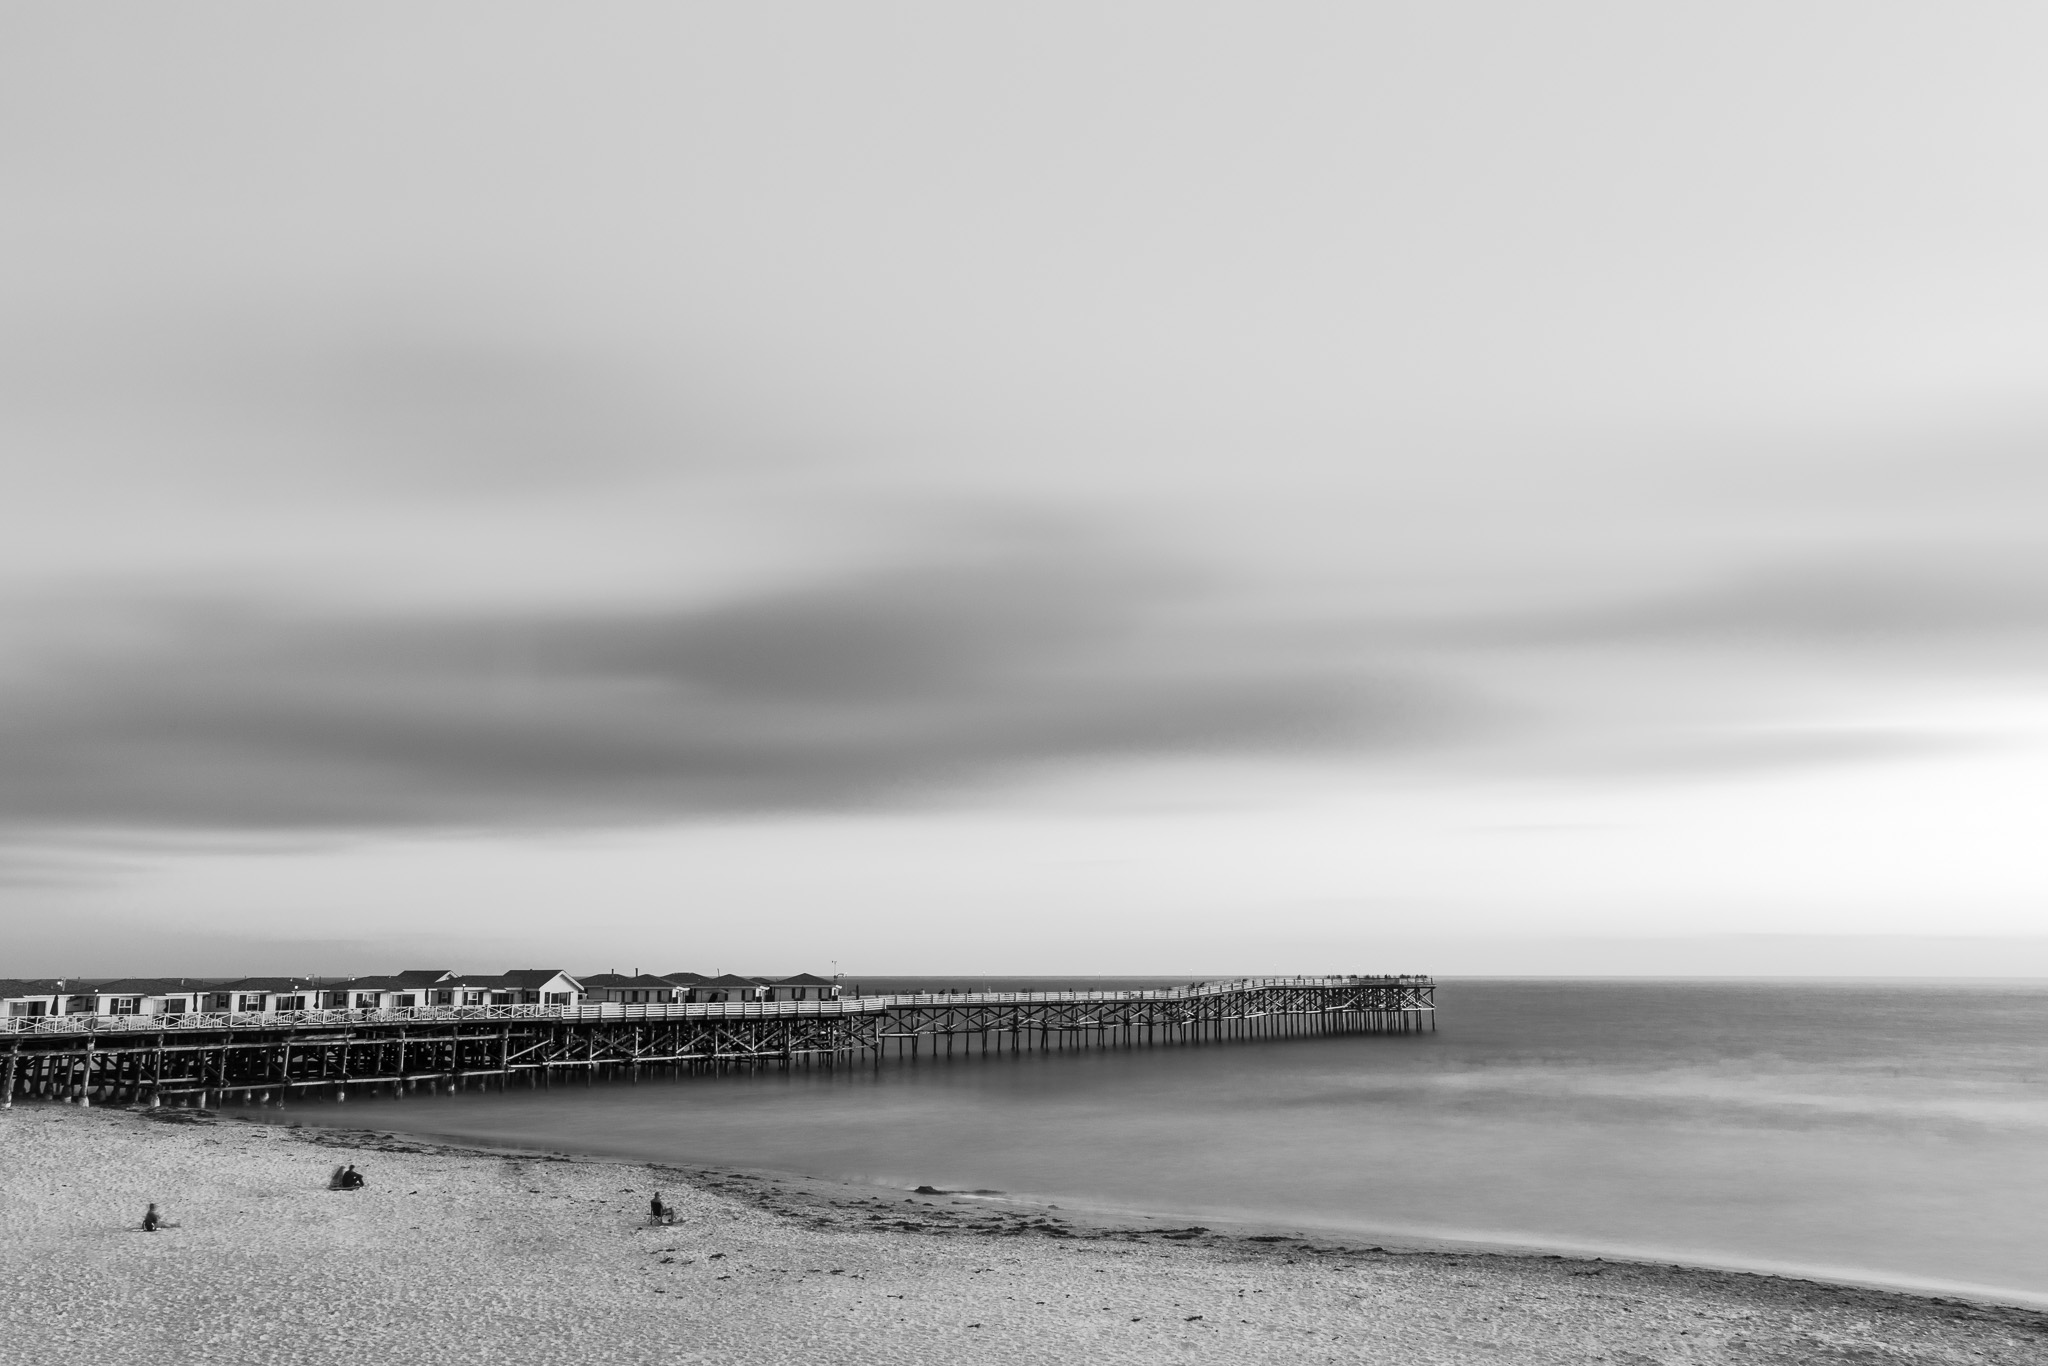 Crystal Pier, Black & White